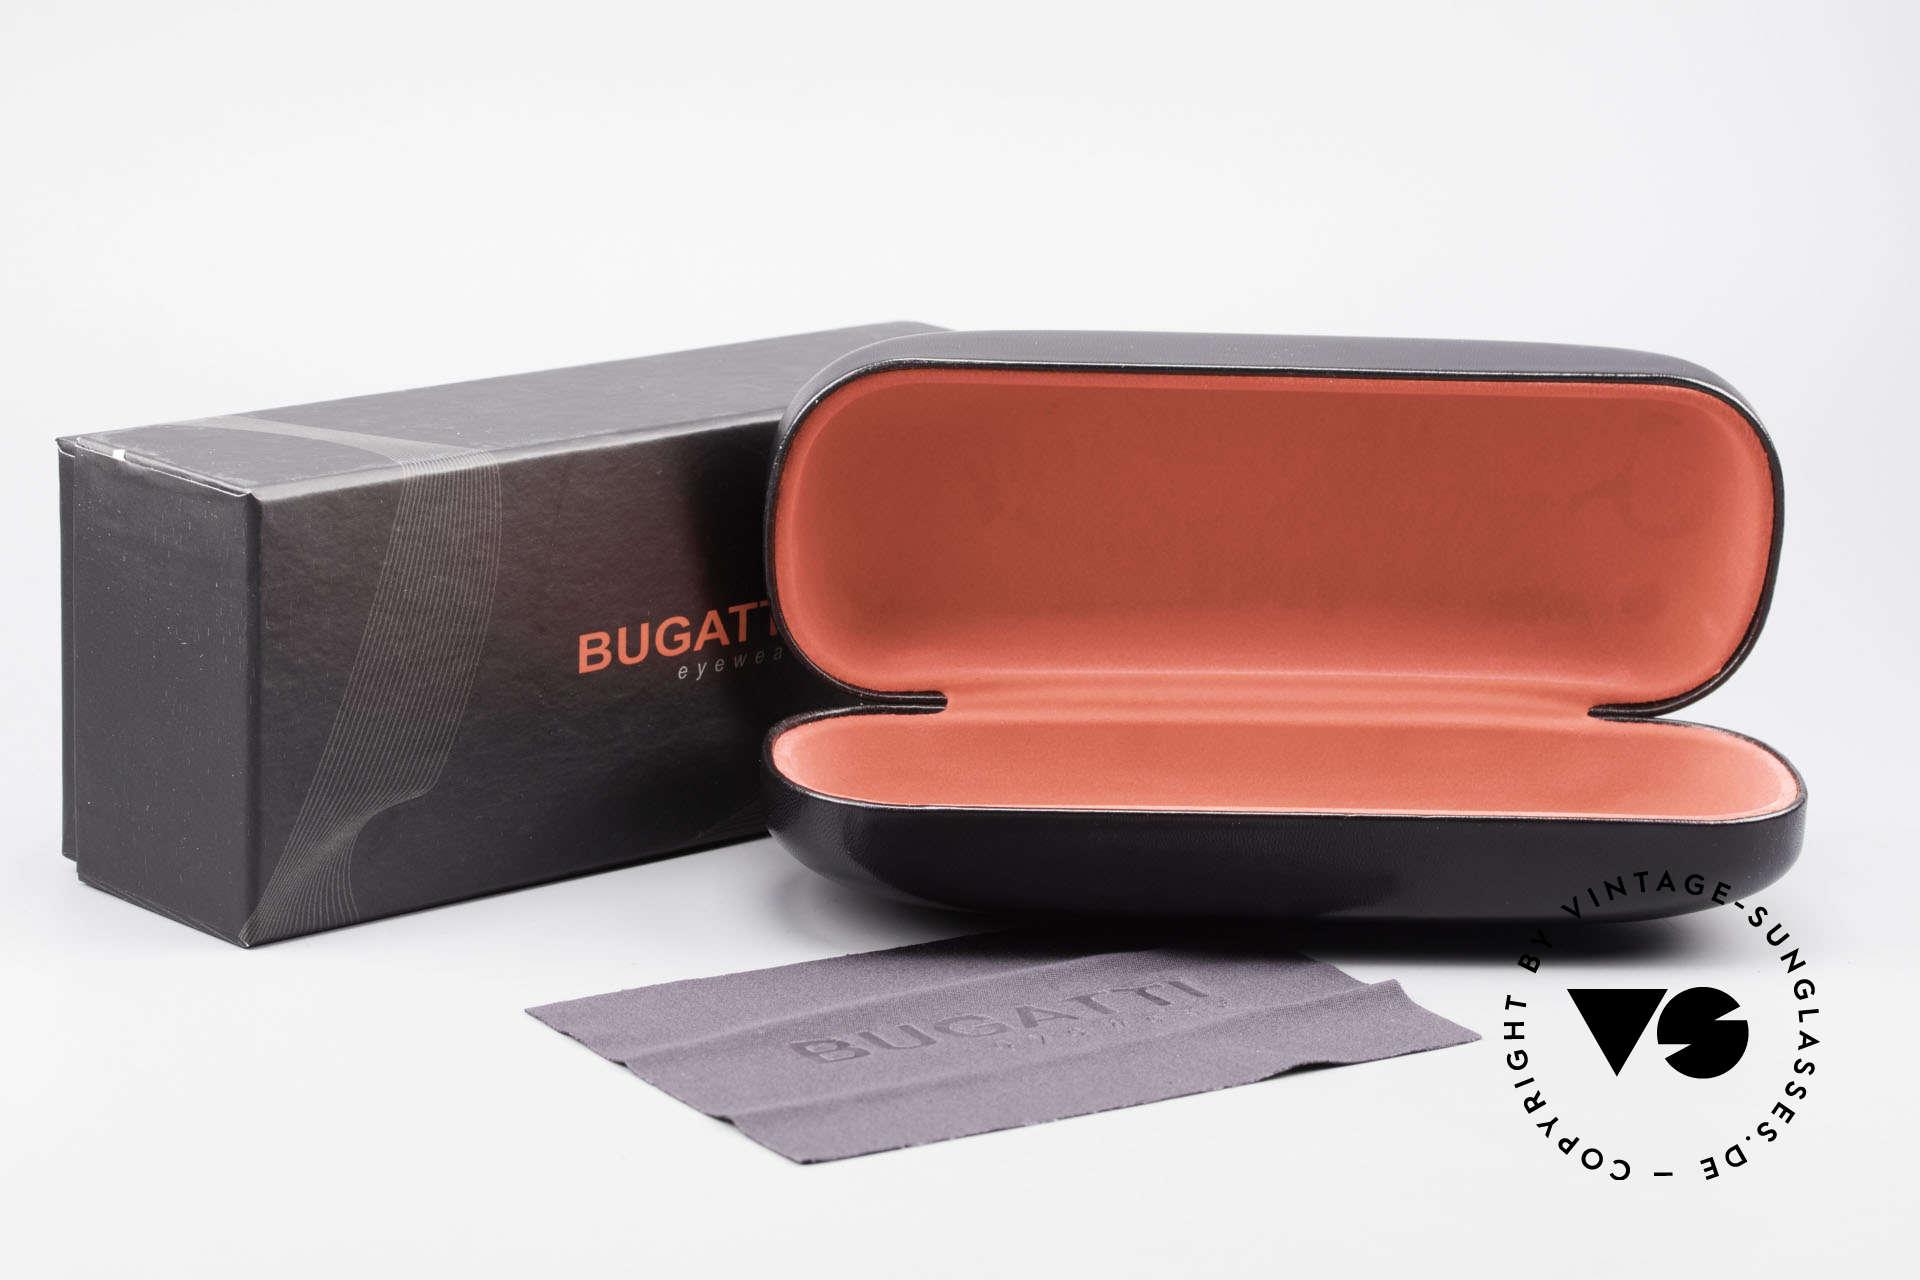 Bugatti 527 Titanium Frame Gold-Plated, Size: medium, Made for Men